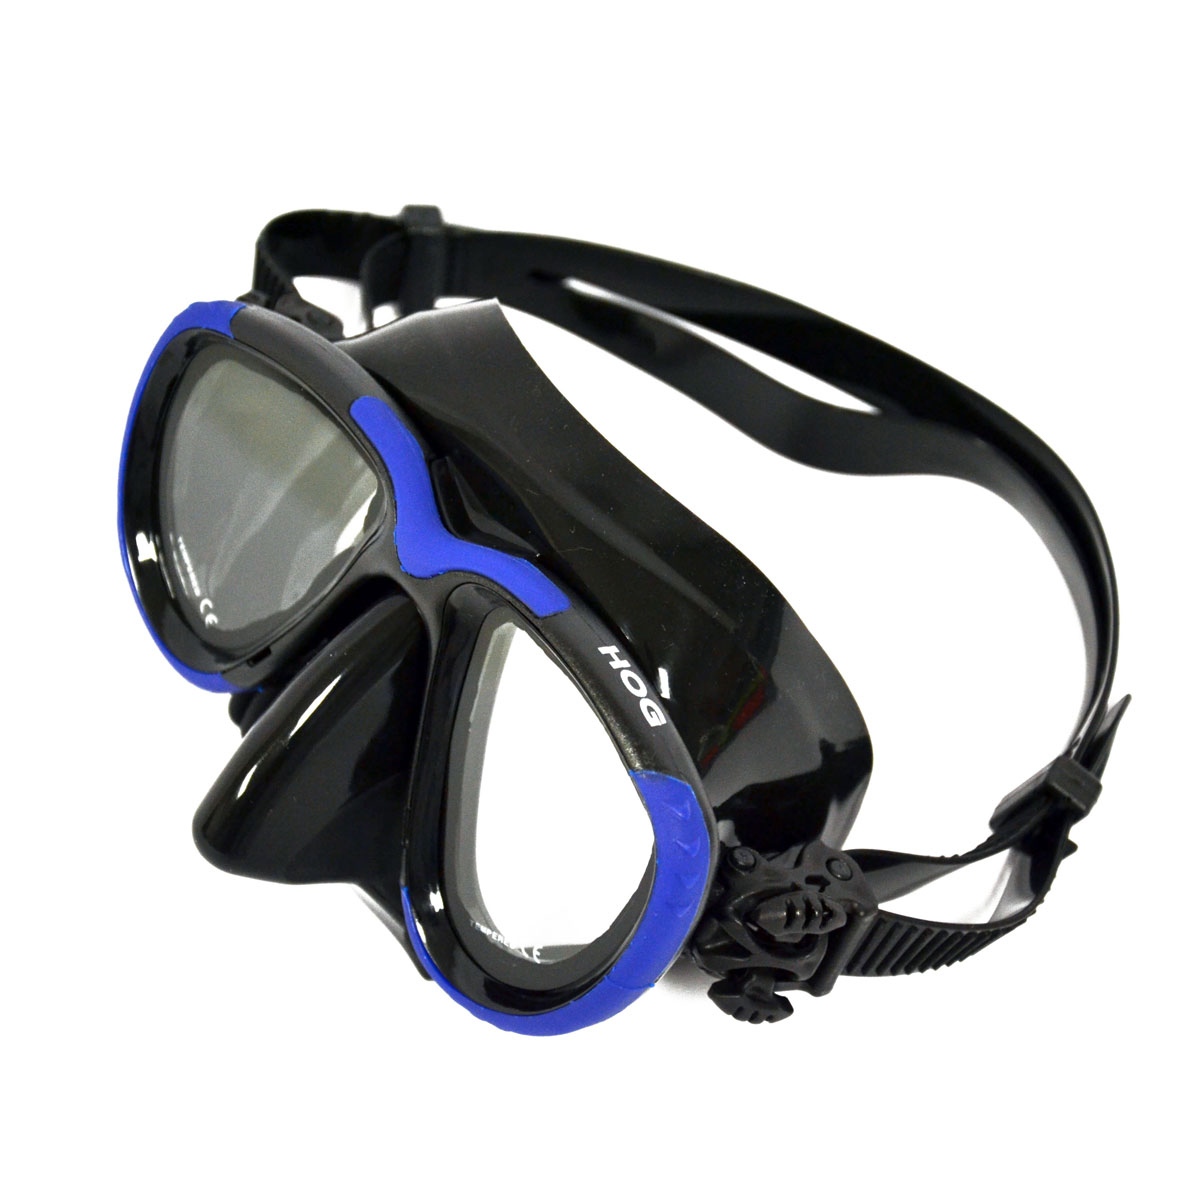 Hog Low Profile 2 Window Tech Mask Blk Blue